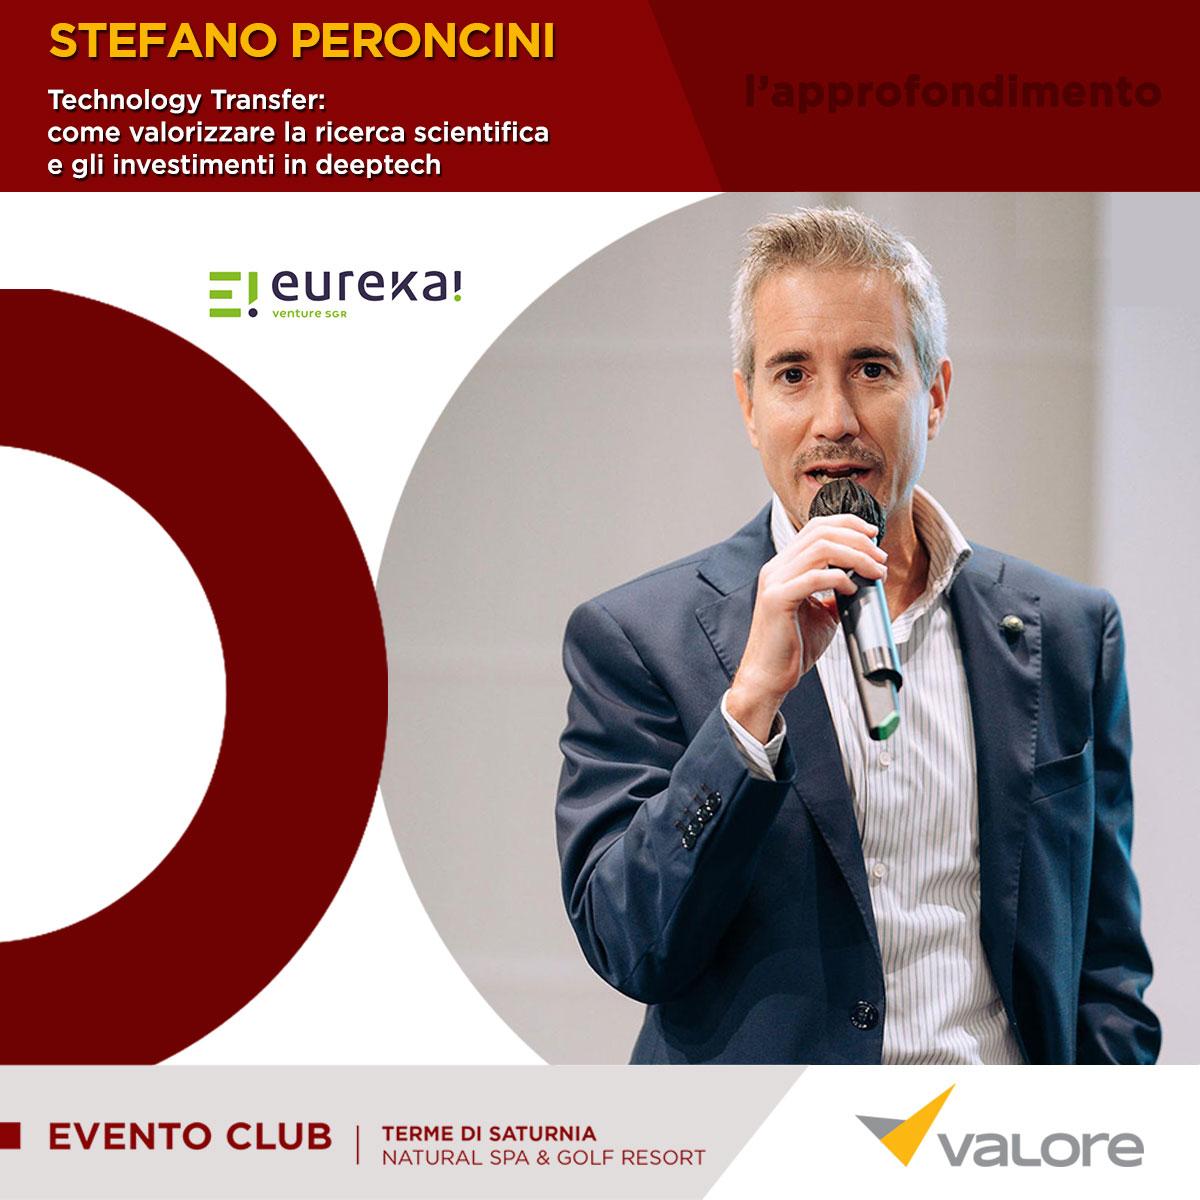 Stefano Peroncini